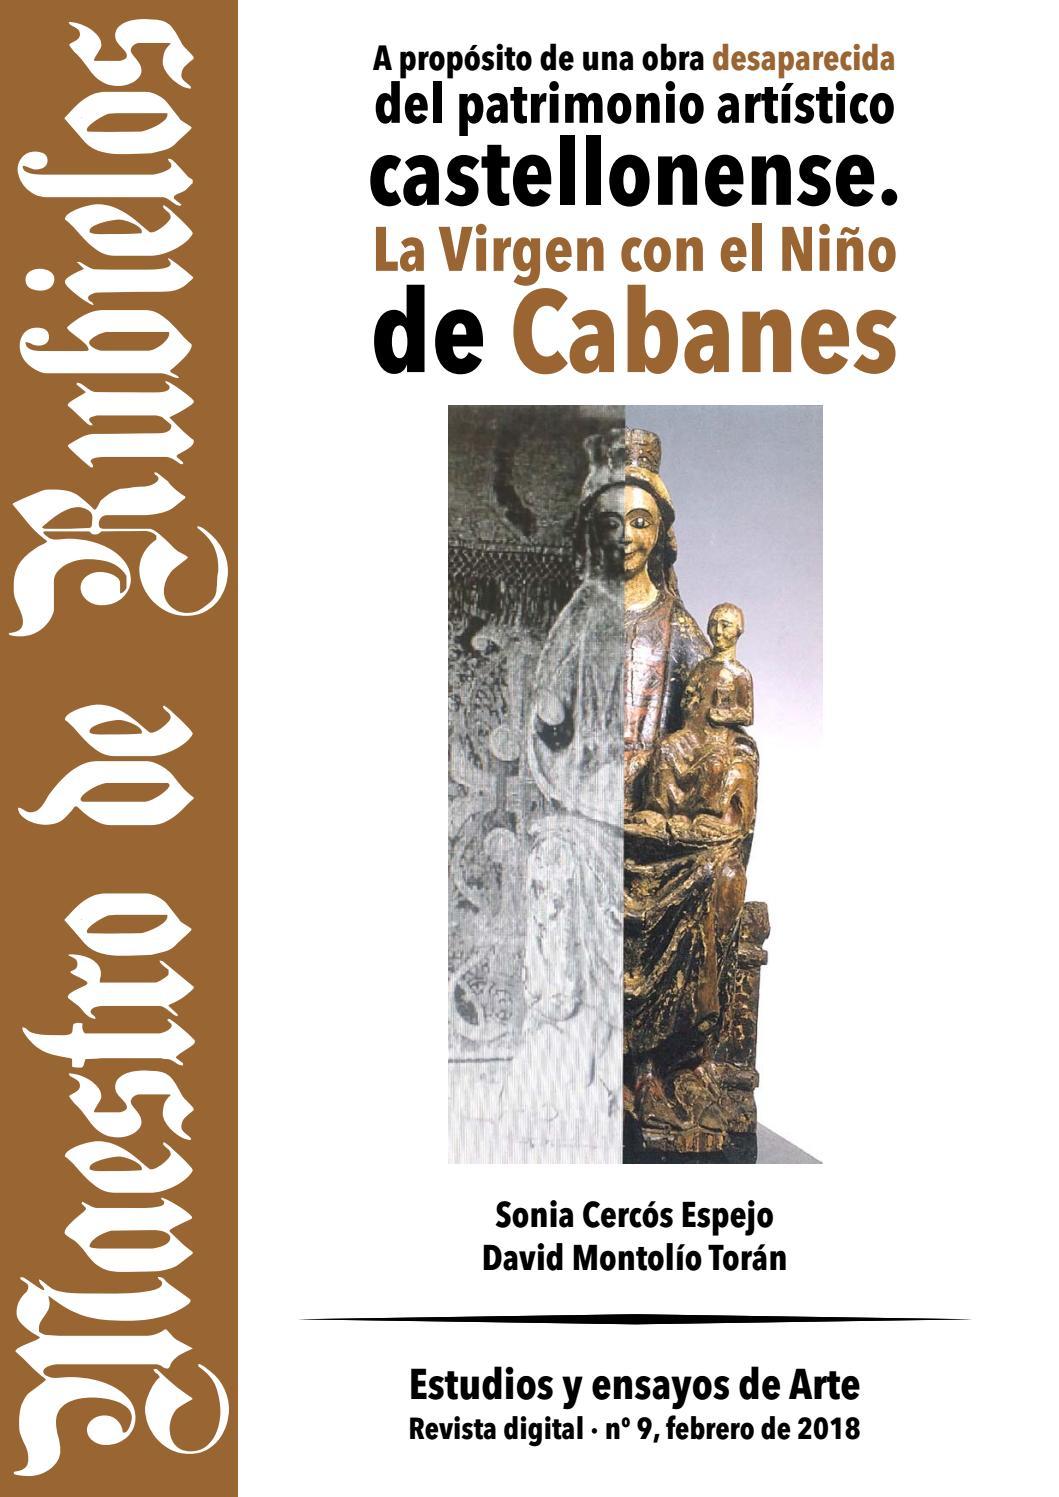 Muebles Gozalbo Nules - Cerc S Y Montol O Santa Mar A De Cabanes By Maestro De Rubielos [mjhdah]https://image.isu.pub/160201170514-cb73912e68cc375cce6c8735a6279f60/jpg/page_1.jpg